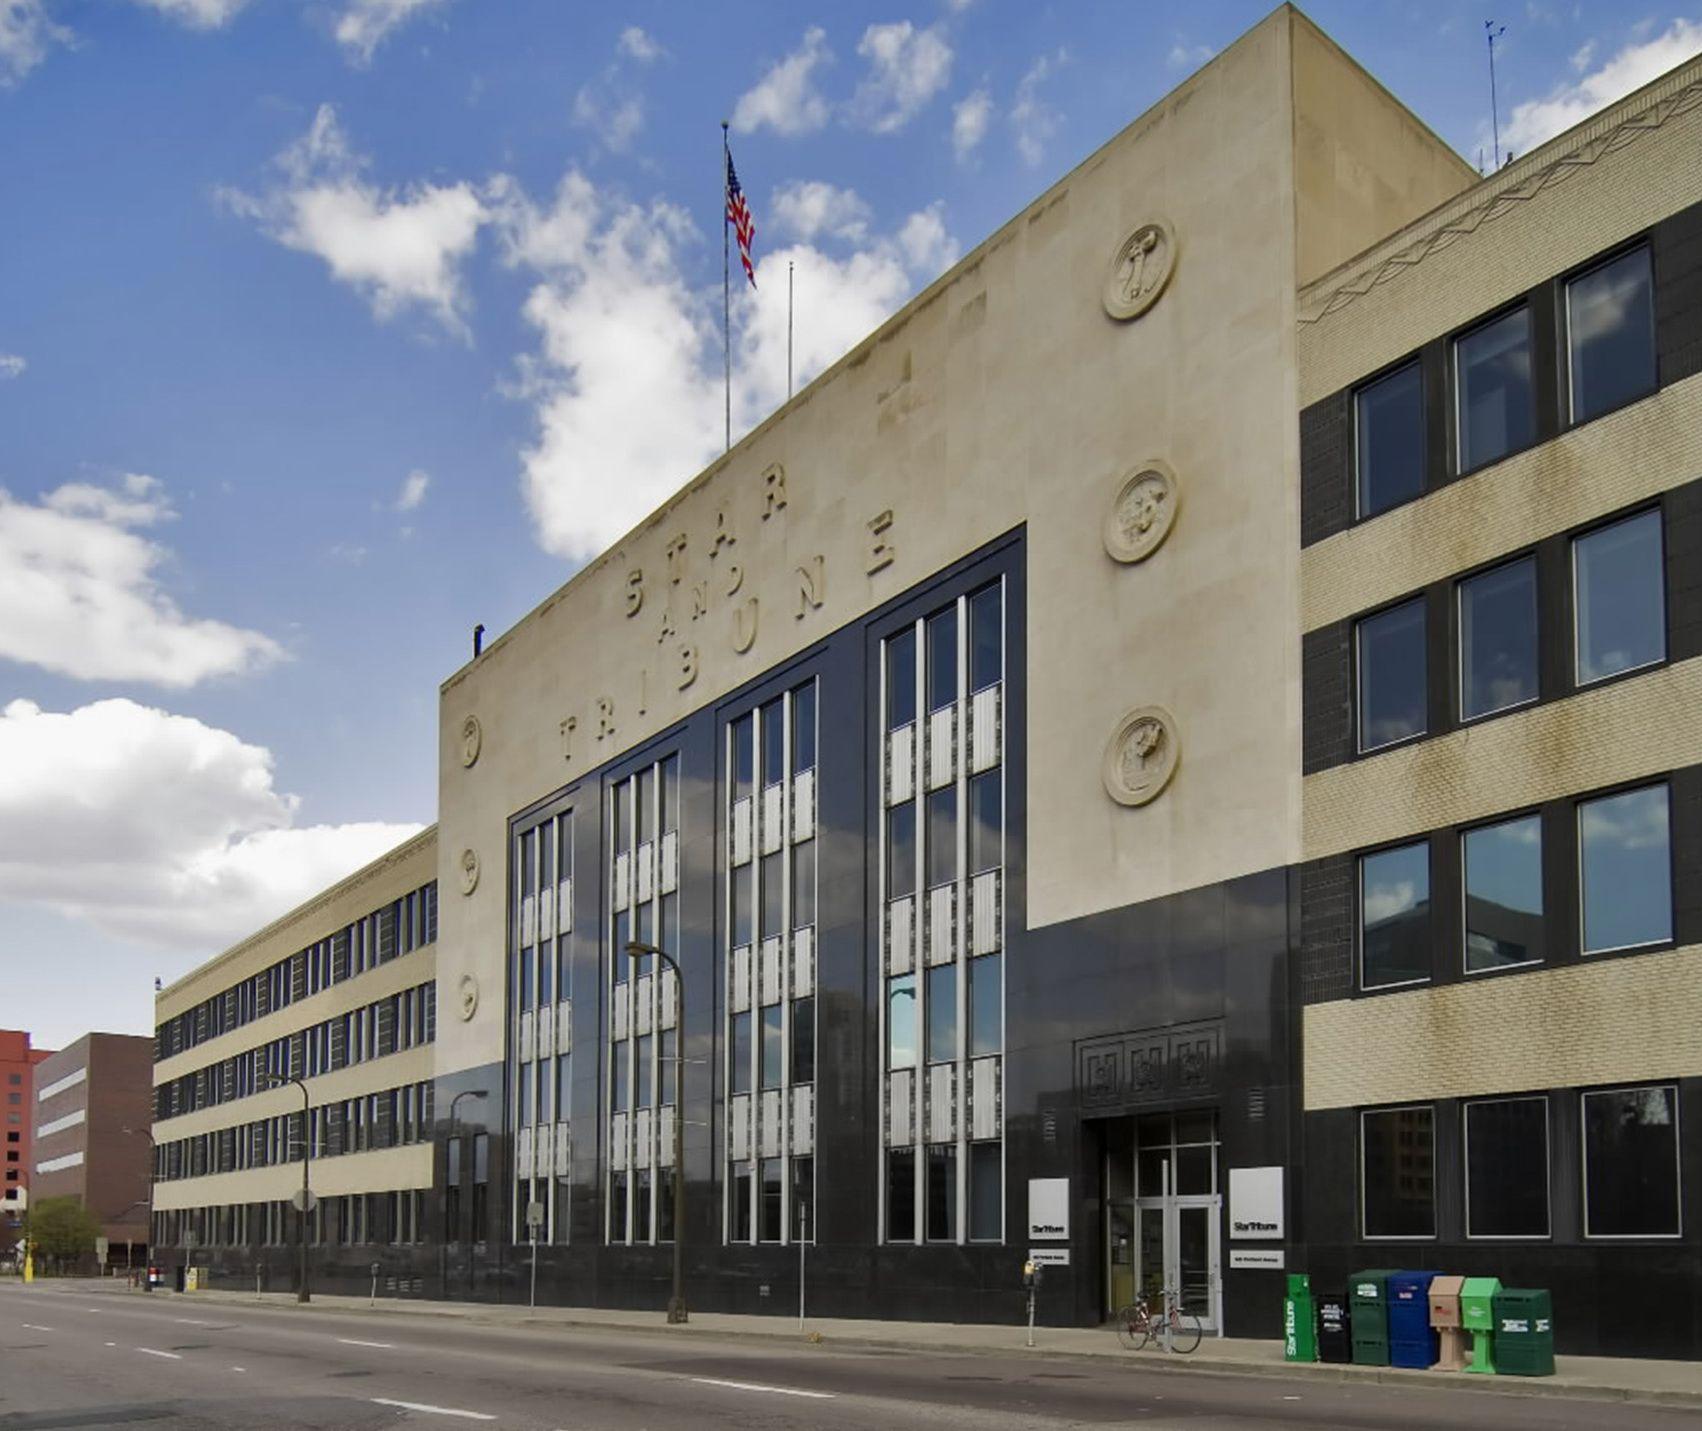 Streetscapes: Star Tribune is last of Minneapolis newspaper buildings | Star Tribune